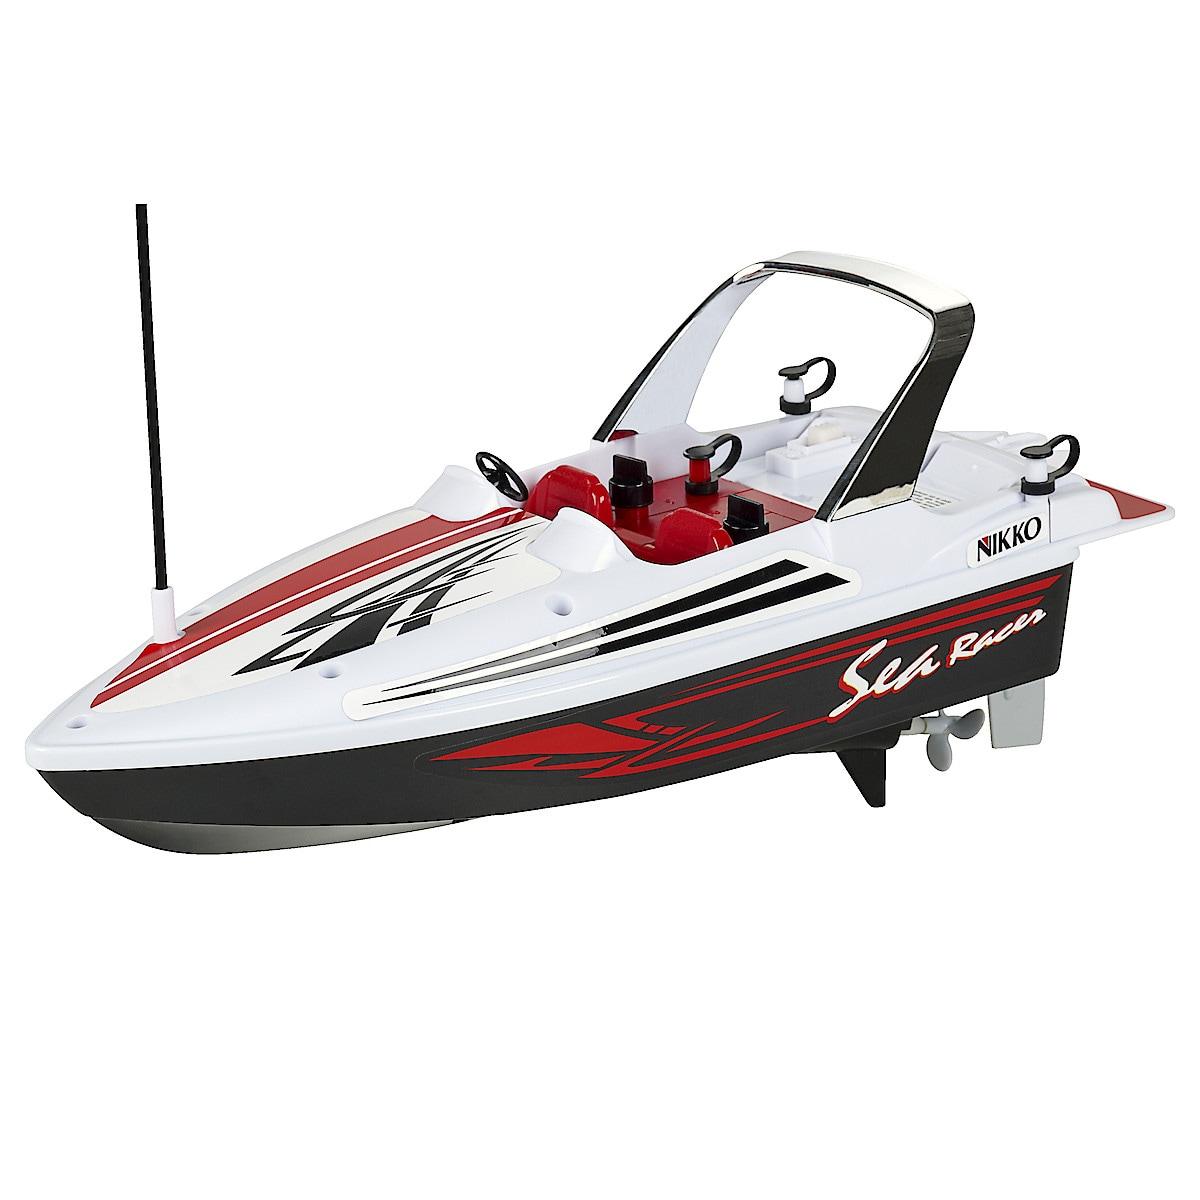 Nikko R/C Sea Racer